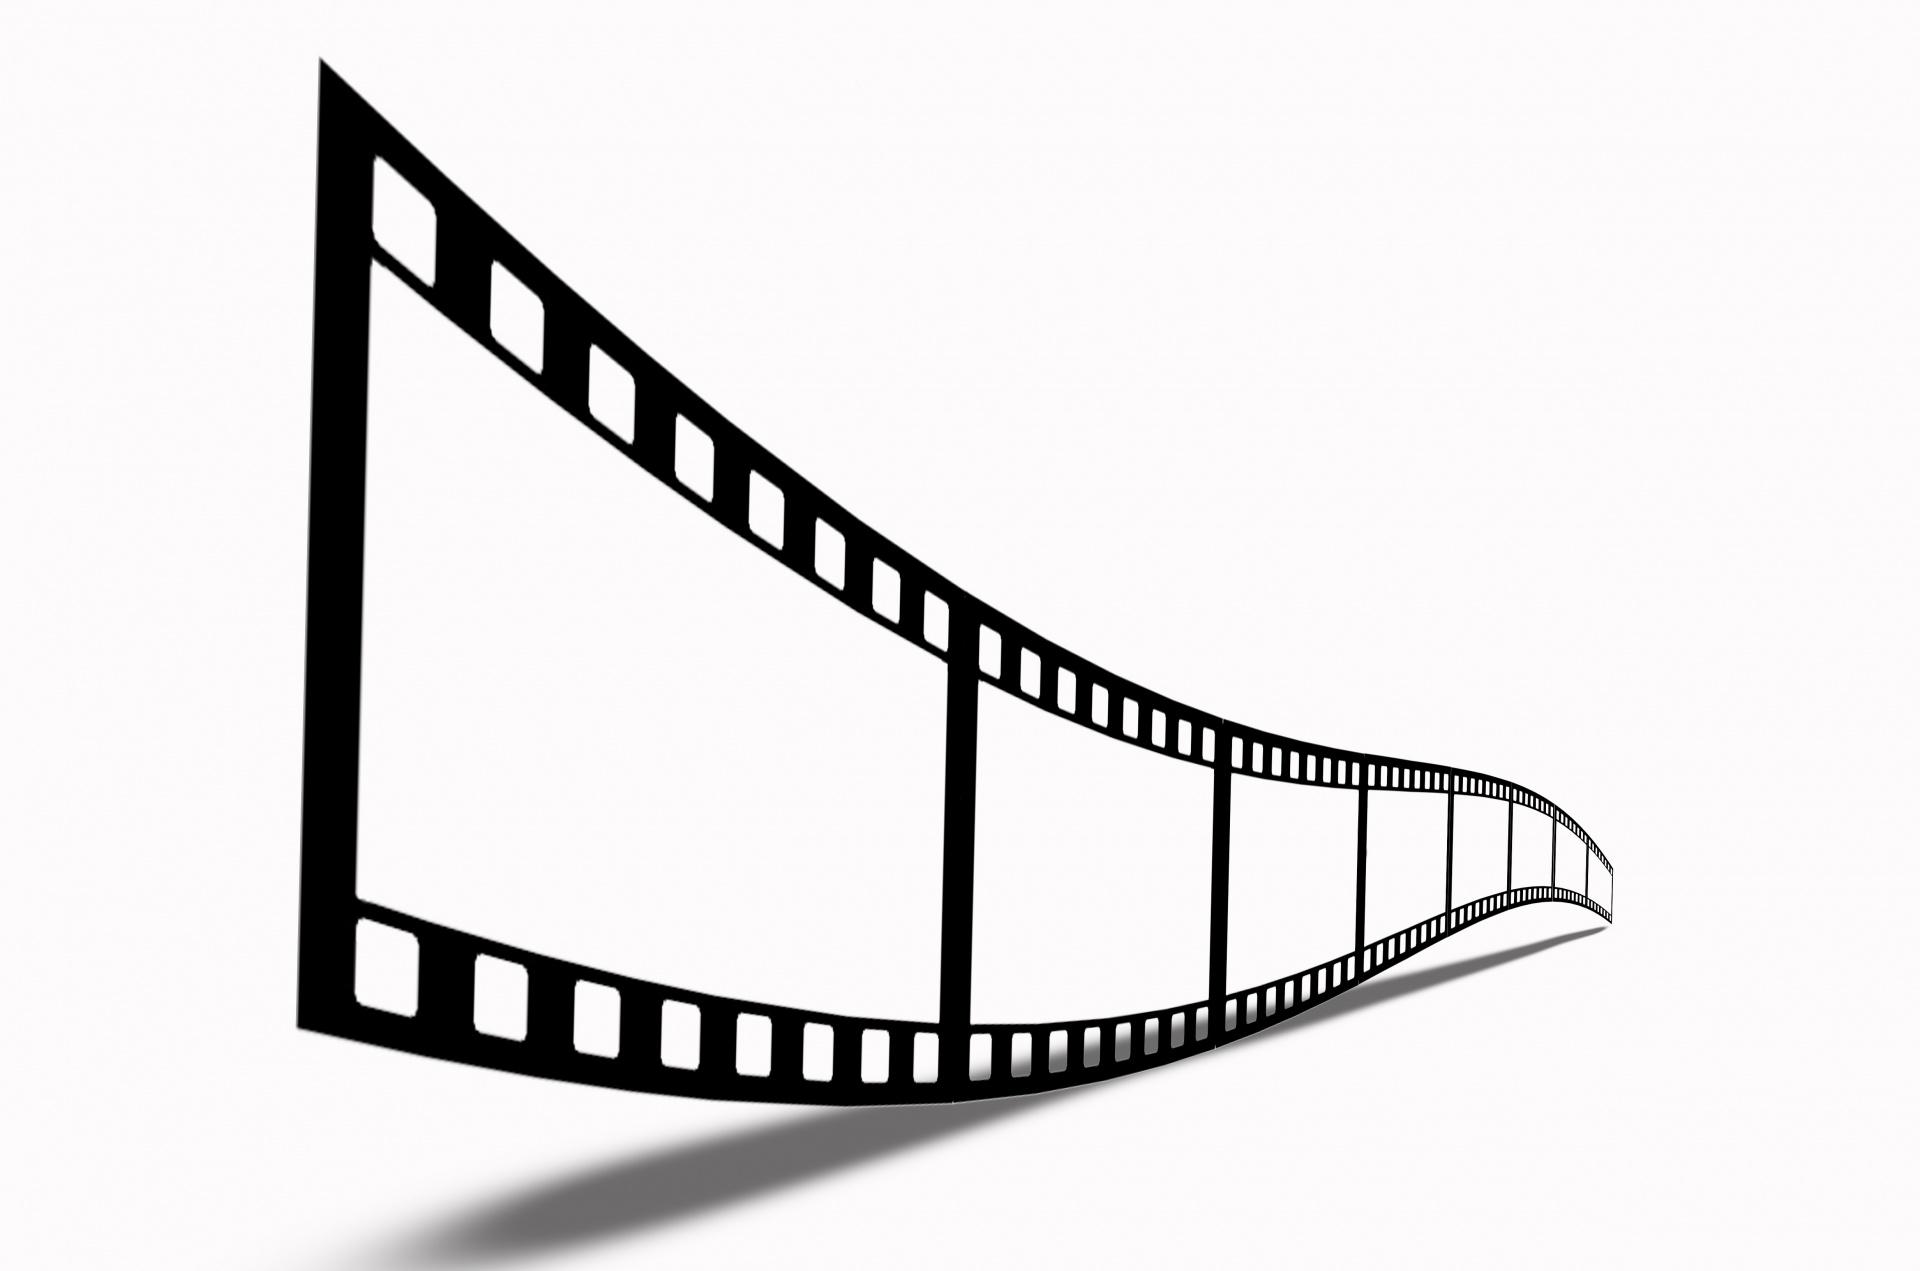 1920x1271 Film Strip Free Stock Photo